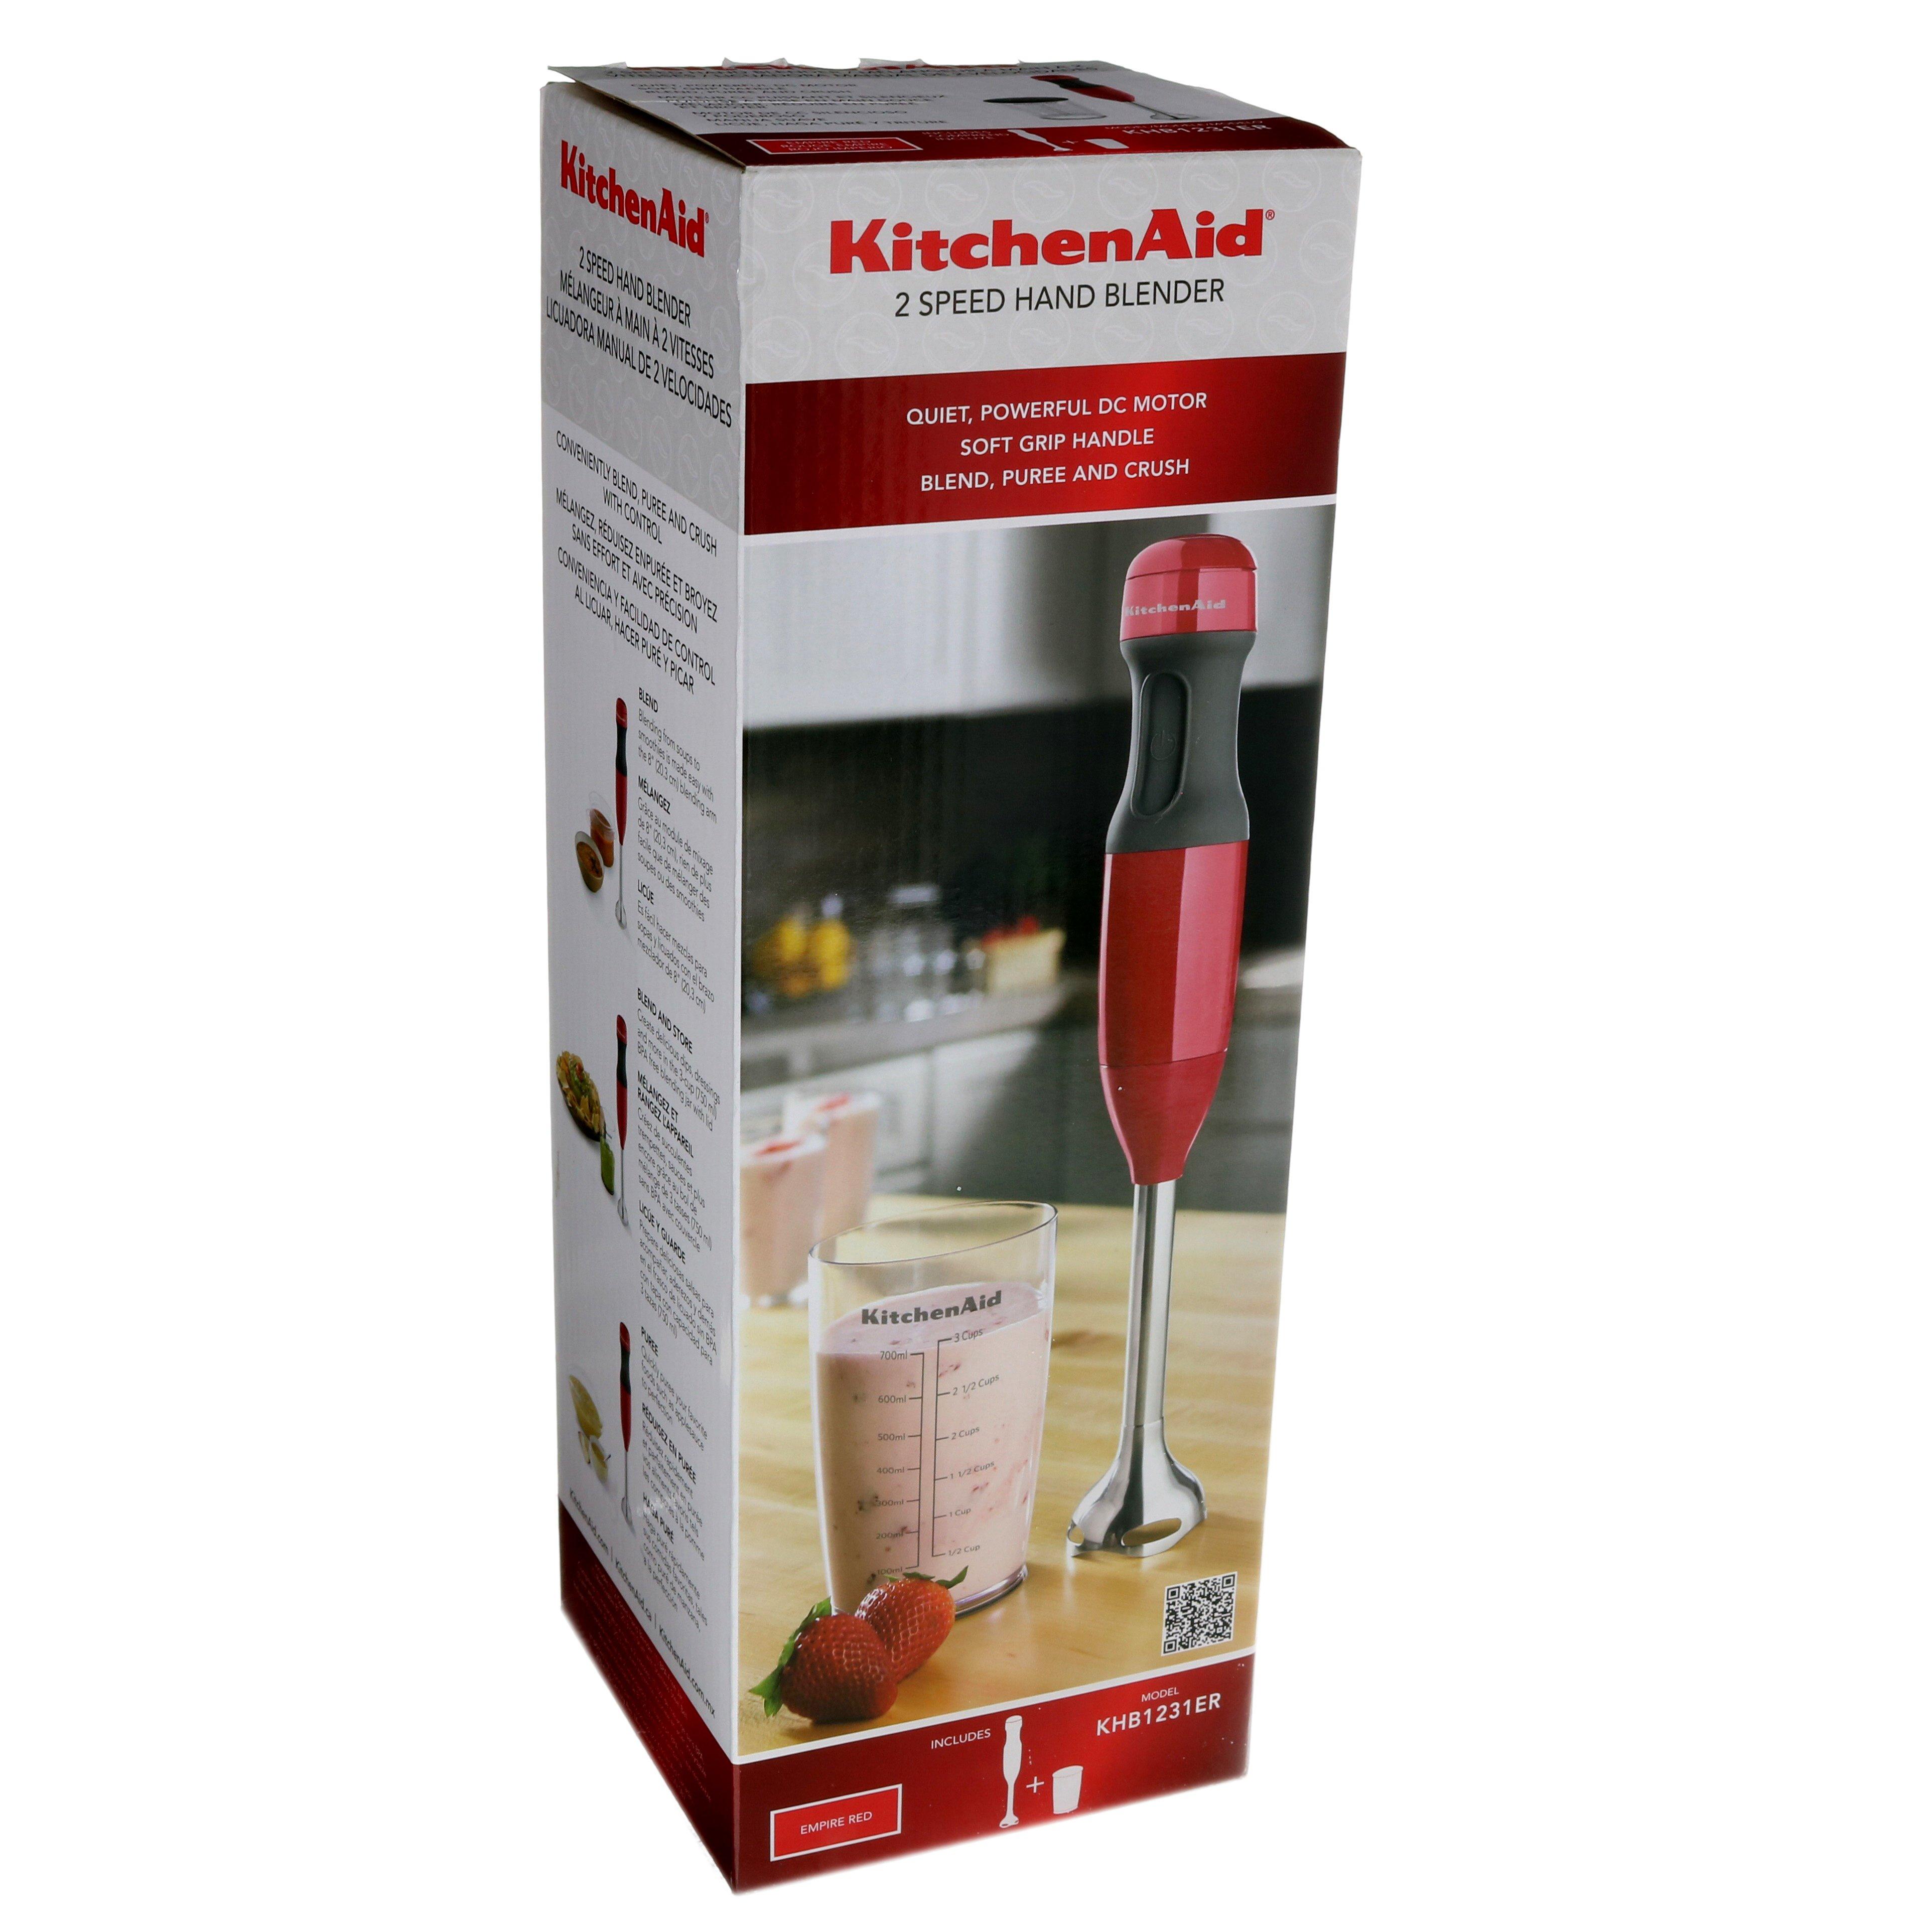 Kitchenaid 2 Speed Hand Blender Red Shop Appliances At H E B